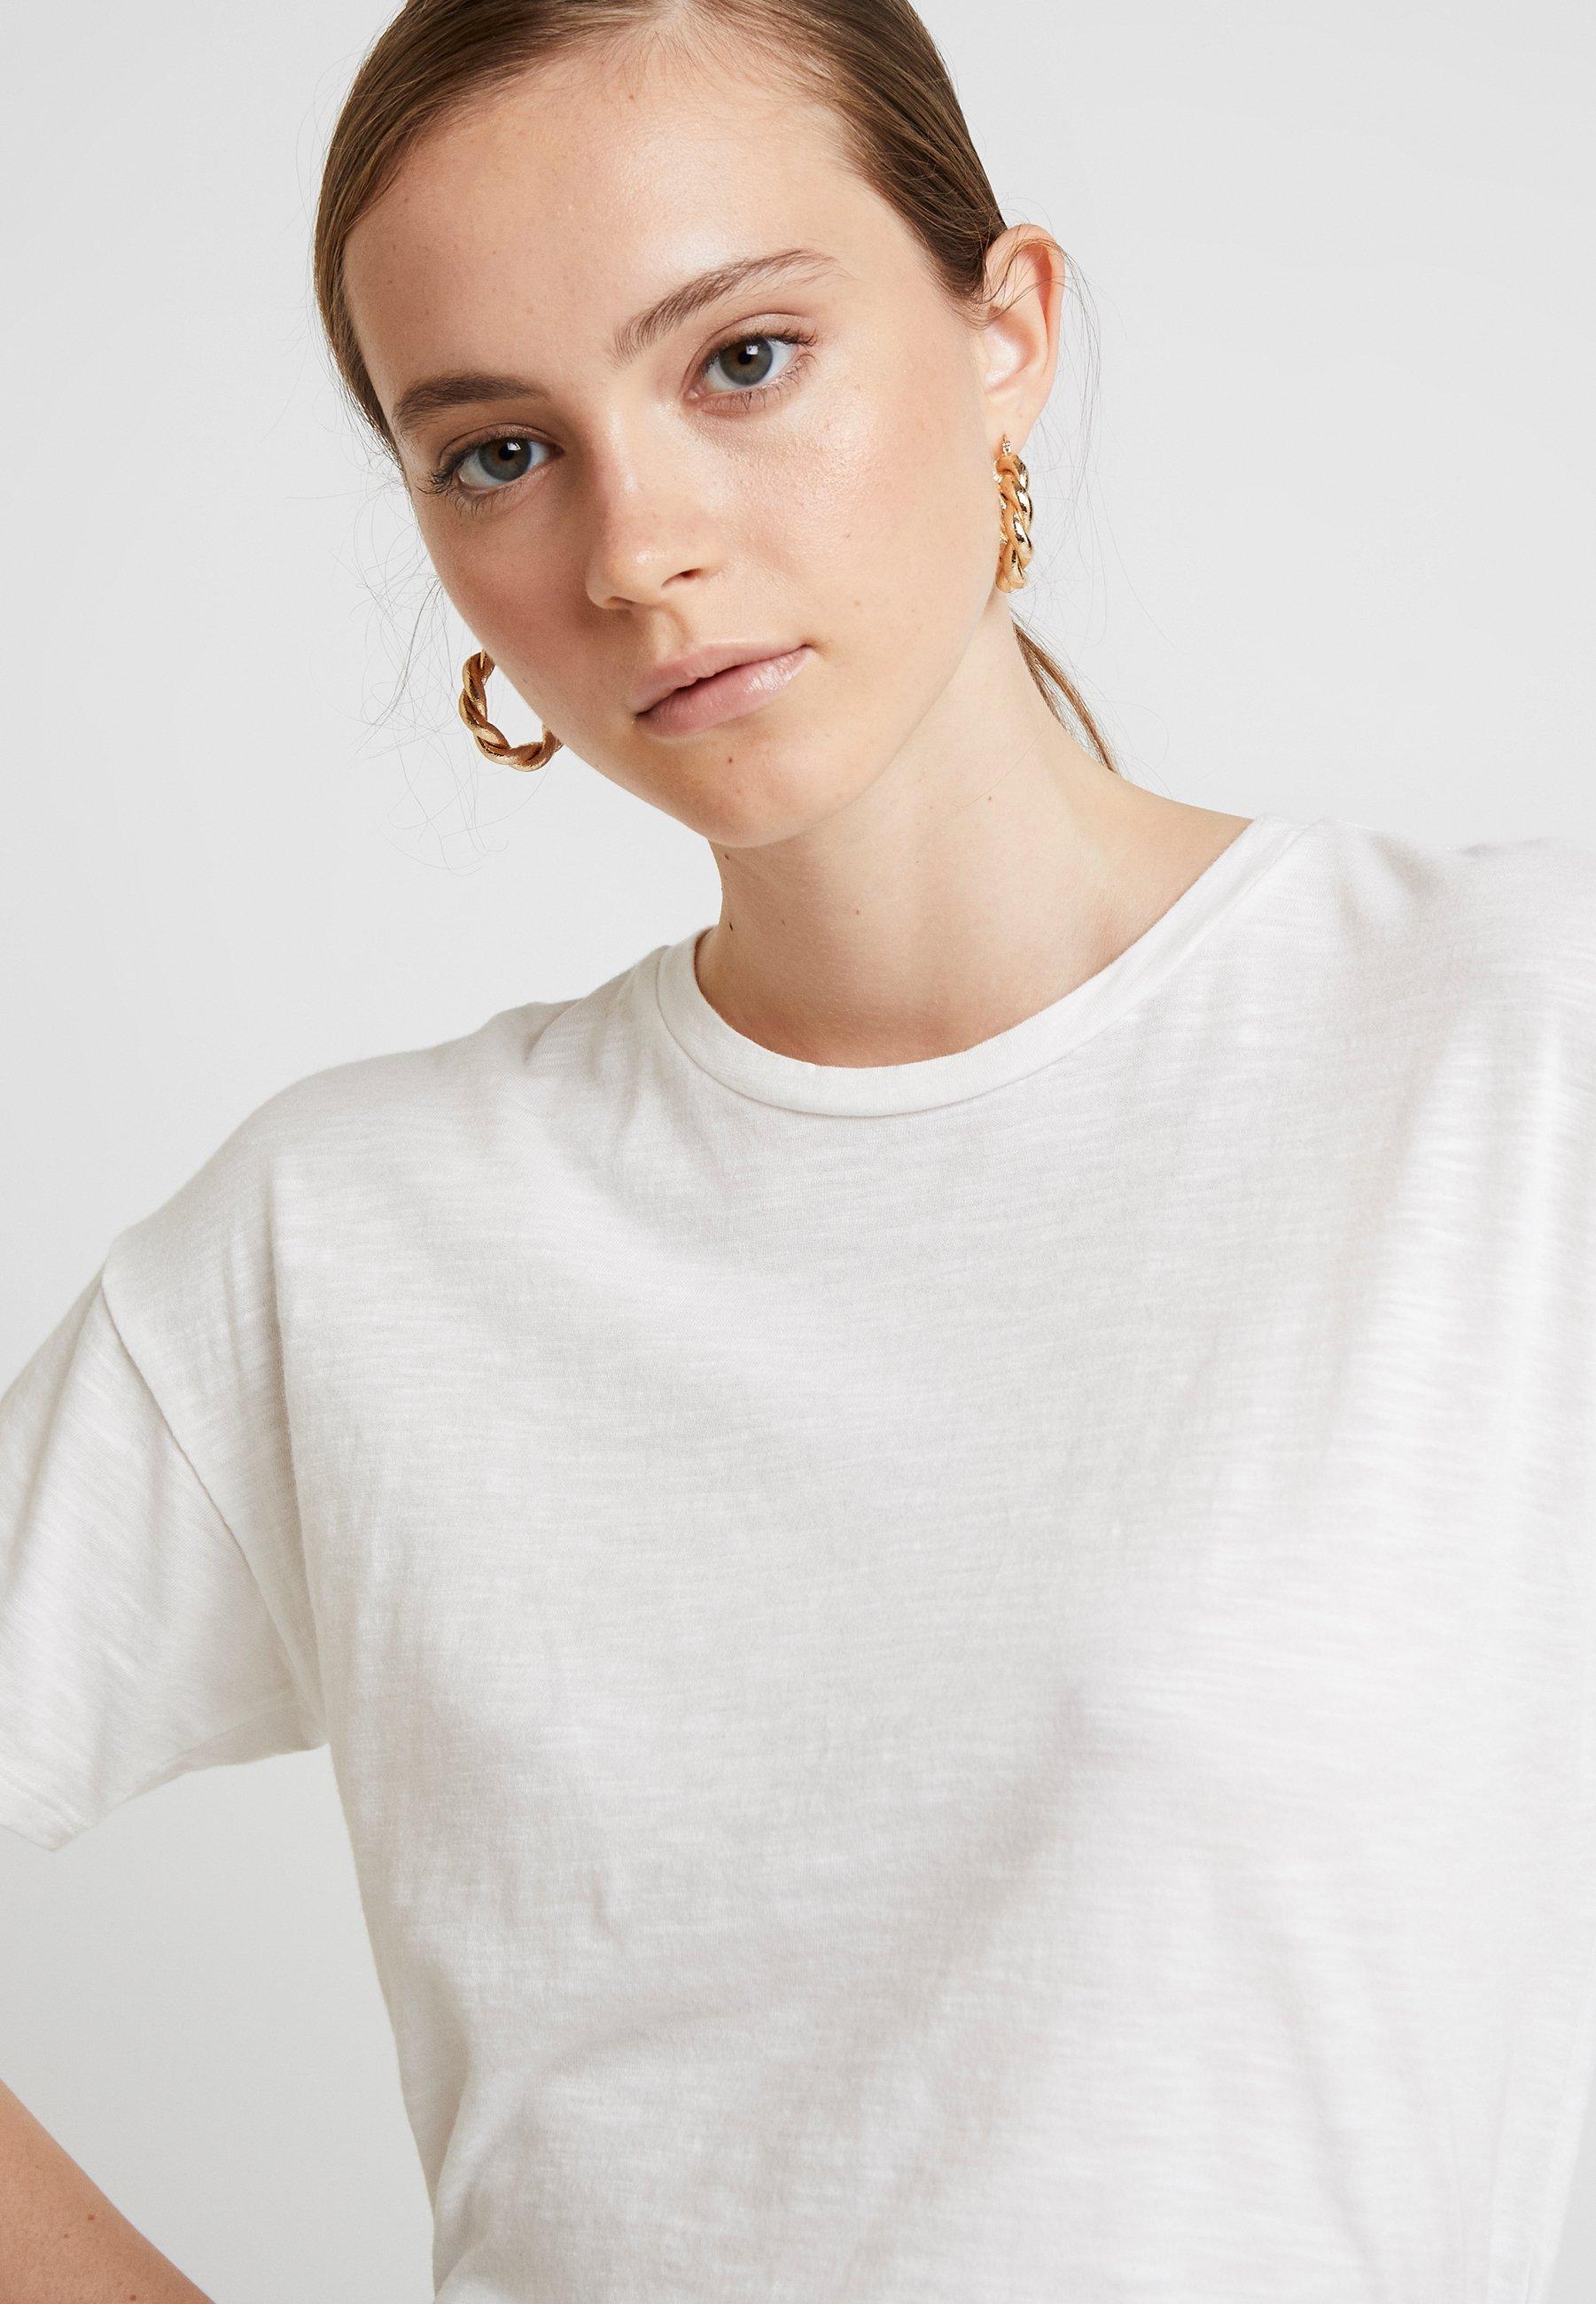 Crop TeeT Natural Boxy White American Eagle Basic shirt Yvbf76yg